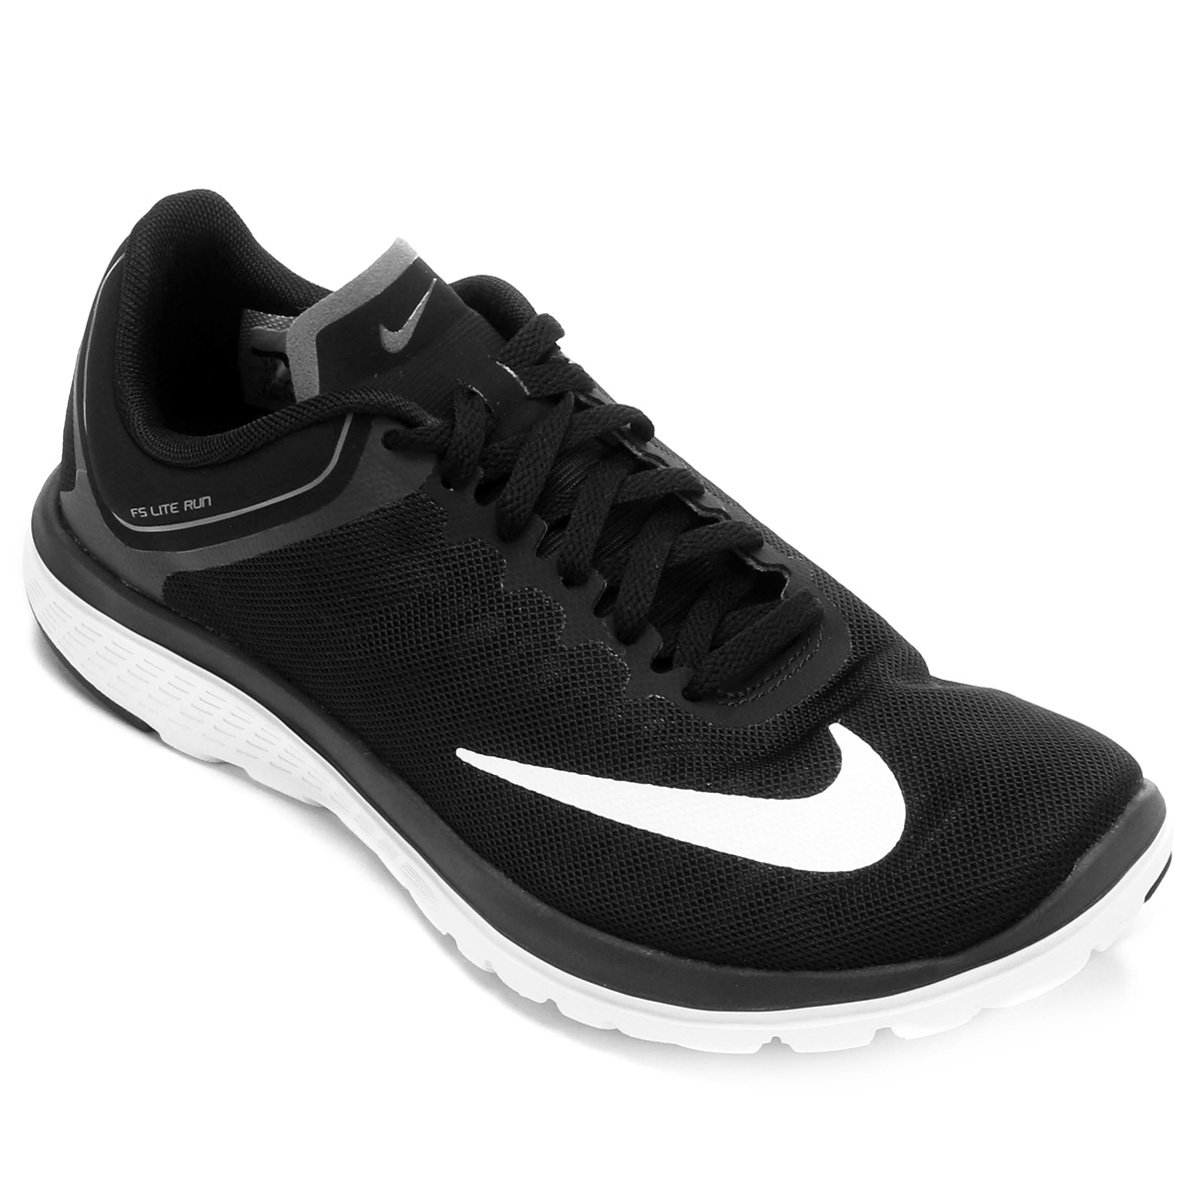 8b390b7cde3 Tênis Nike Fs Lite Run 4 Feminino - Compre Agora